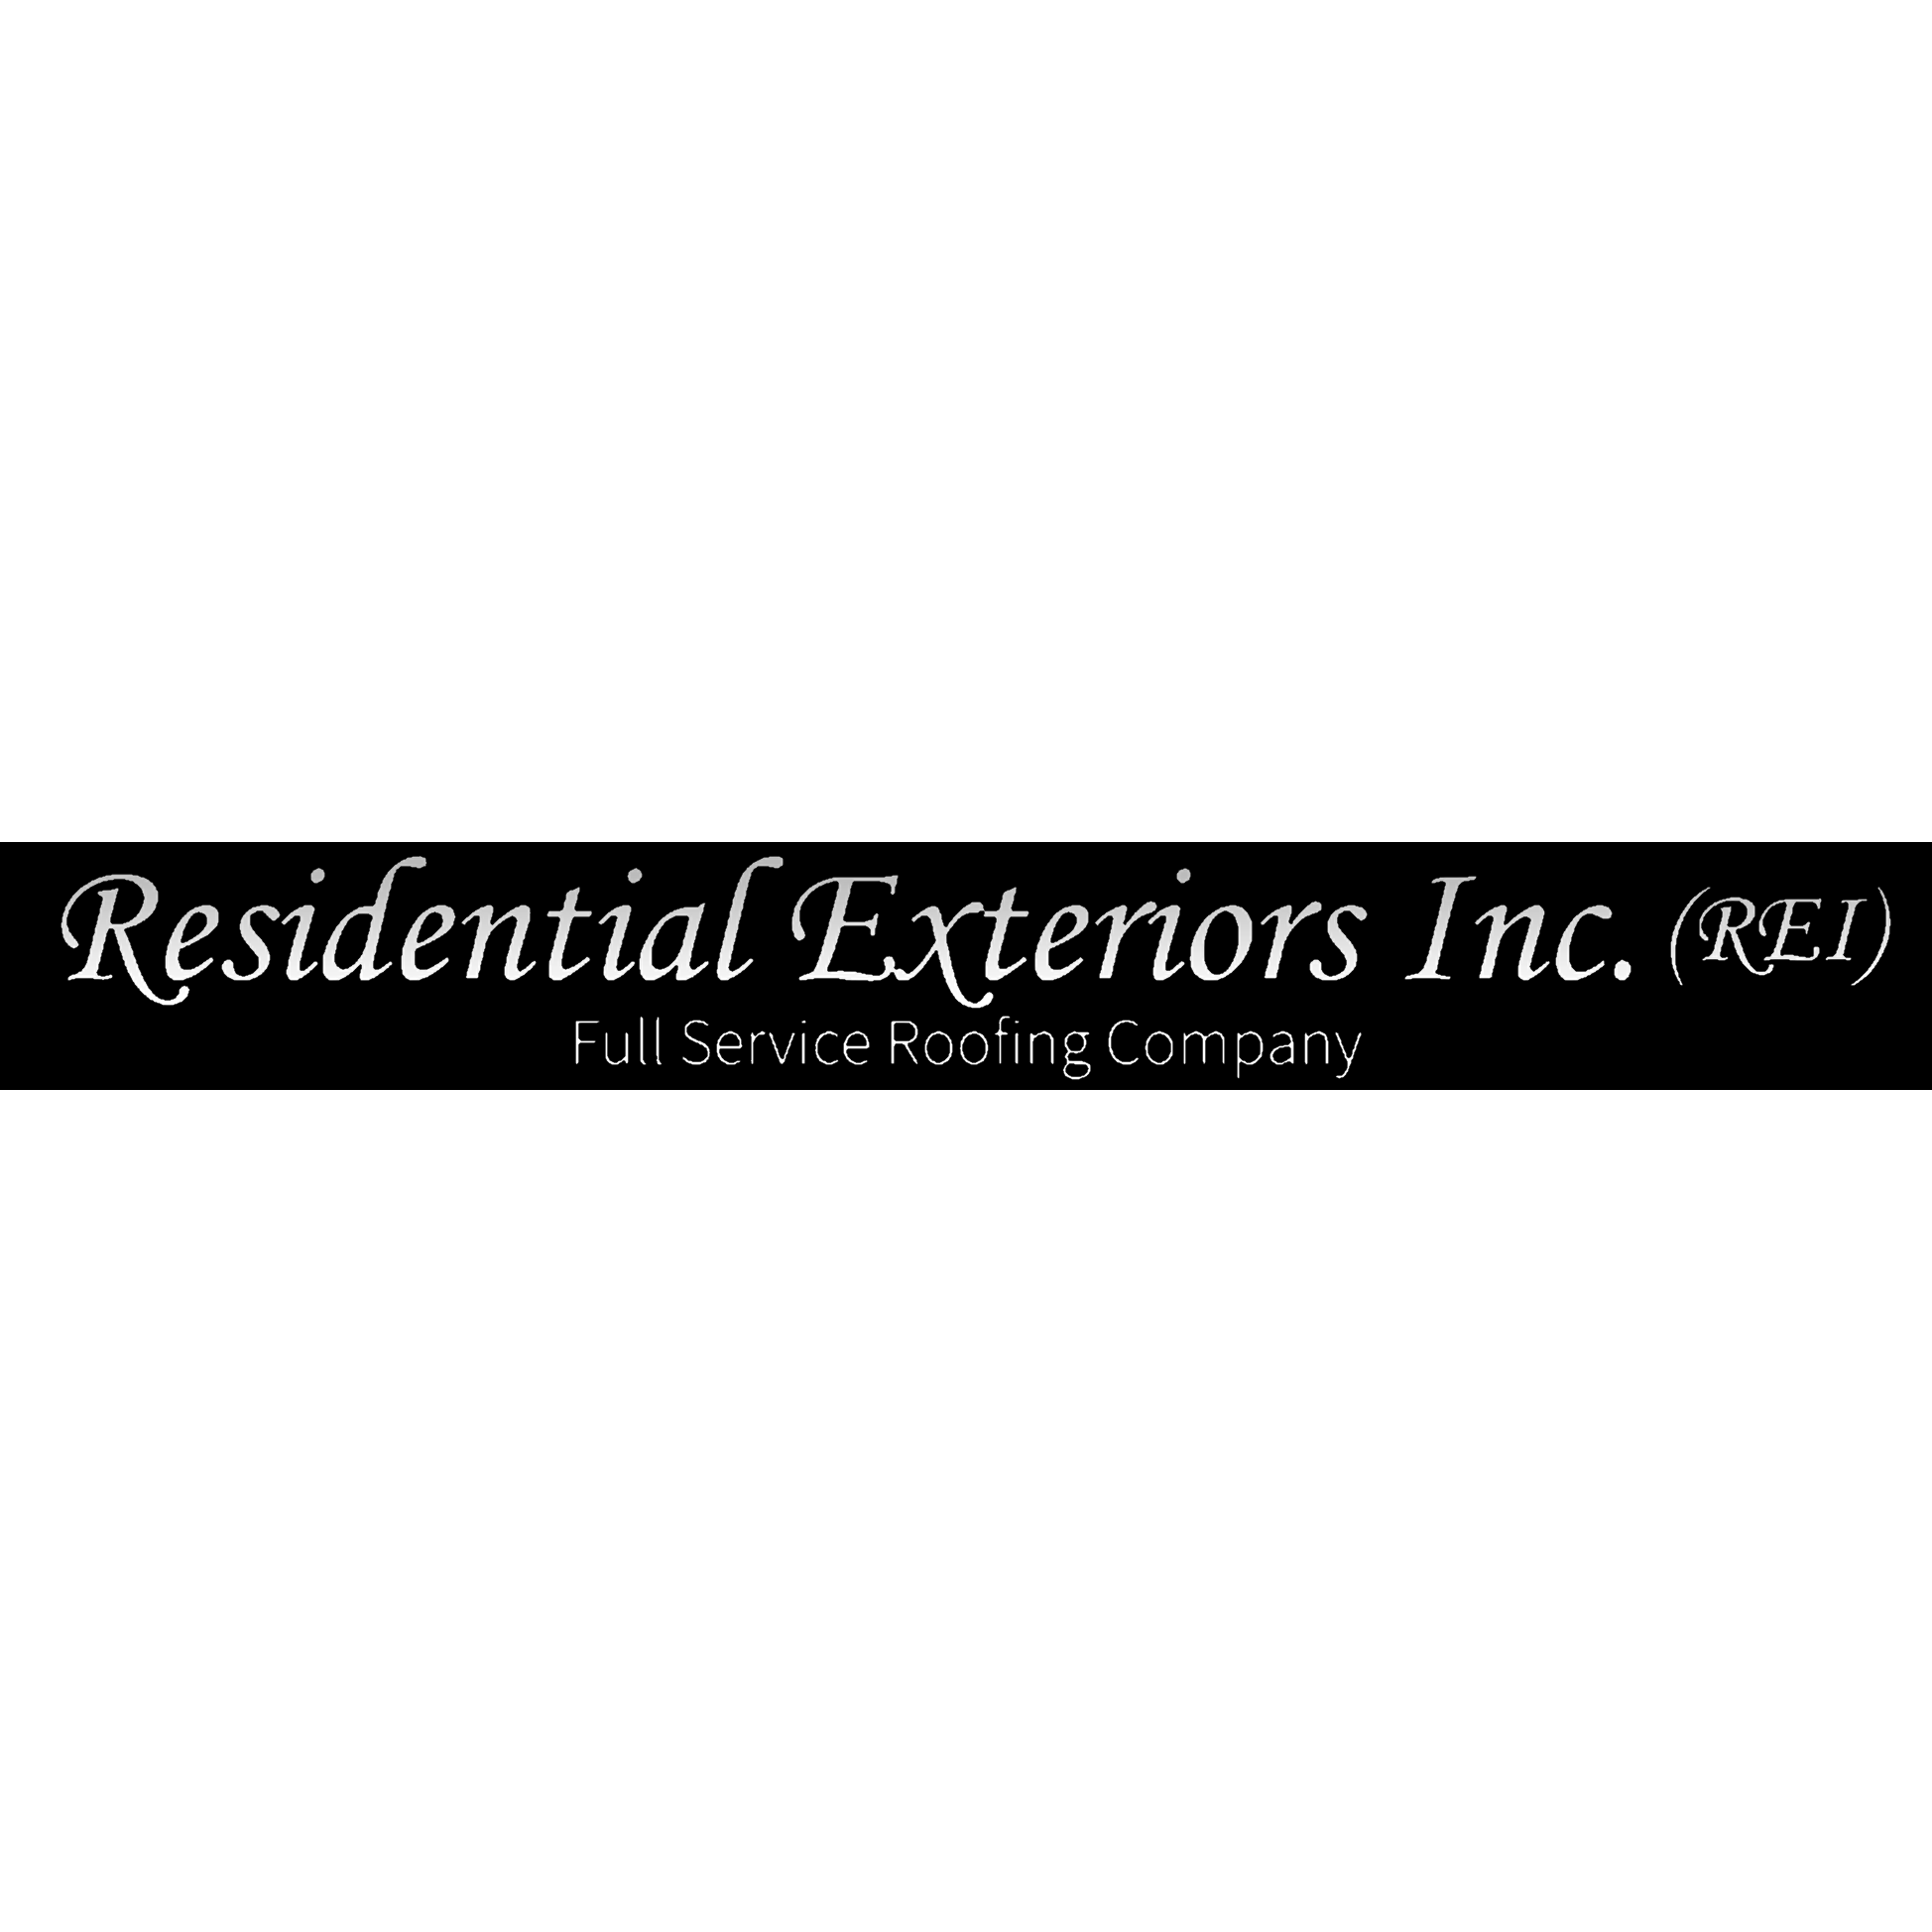 Residential Exteriors Inc.